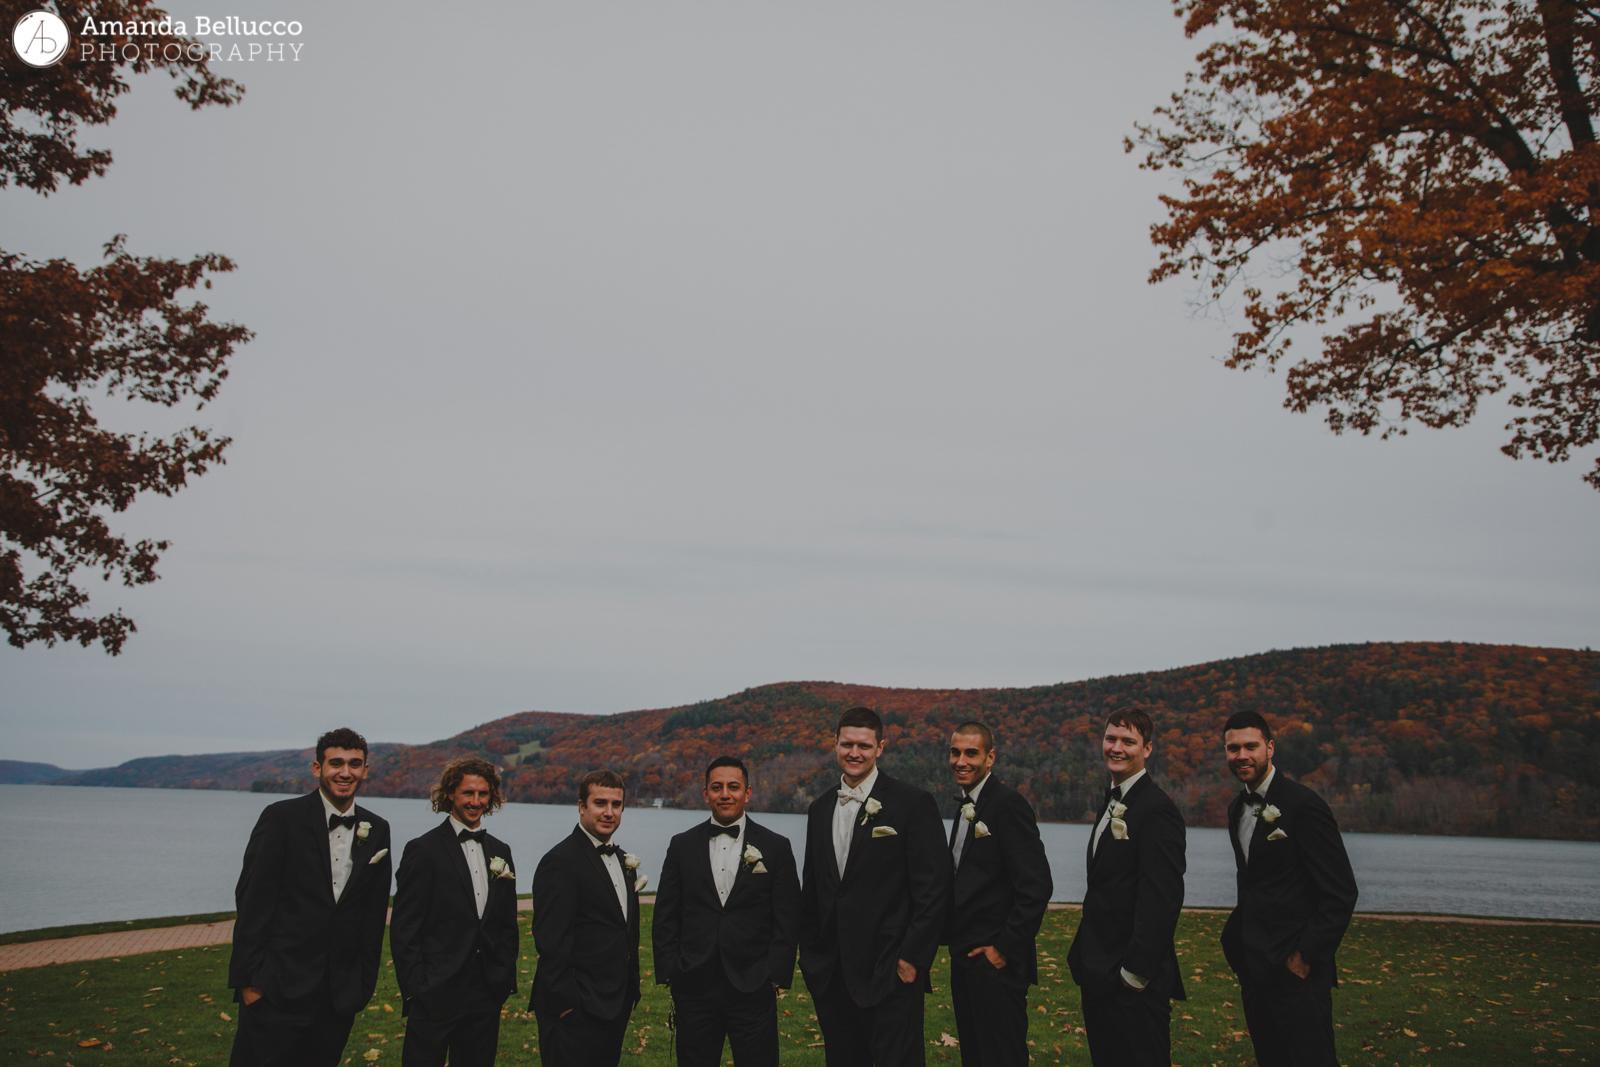 syracuse-rochester-fine-art-wedding-photographer-73.JPG